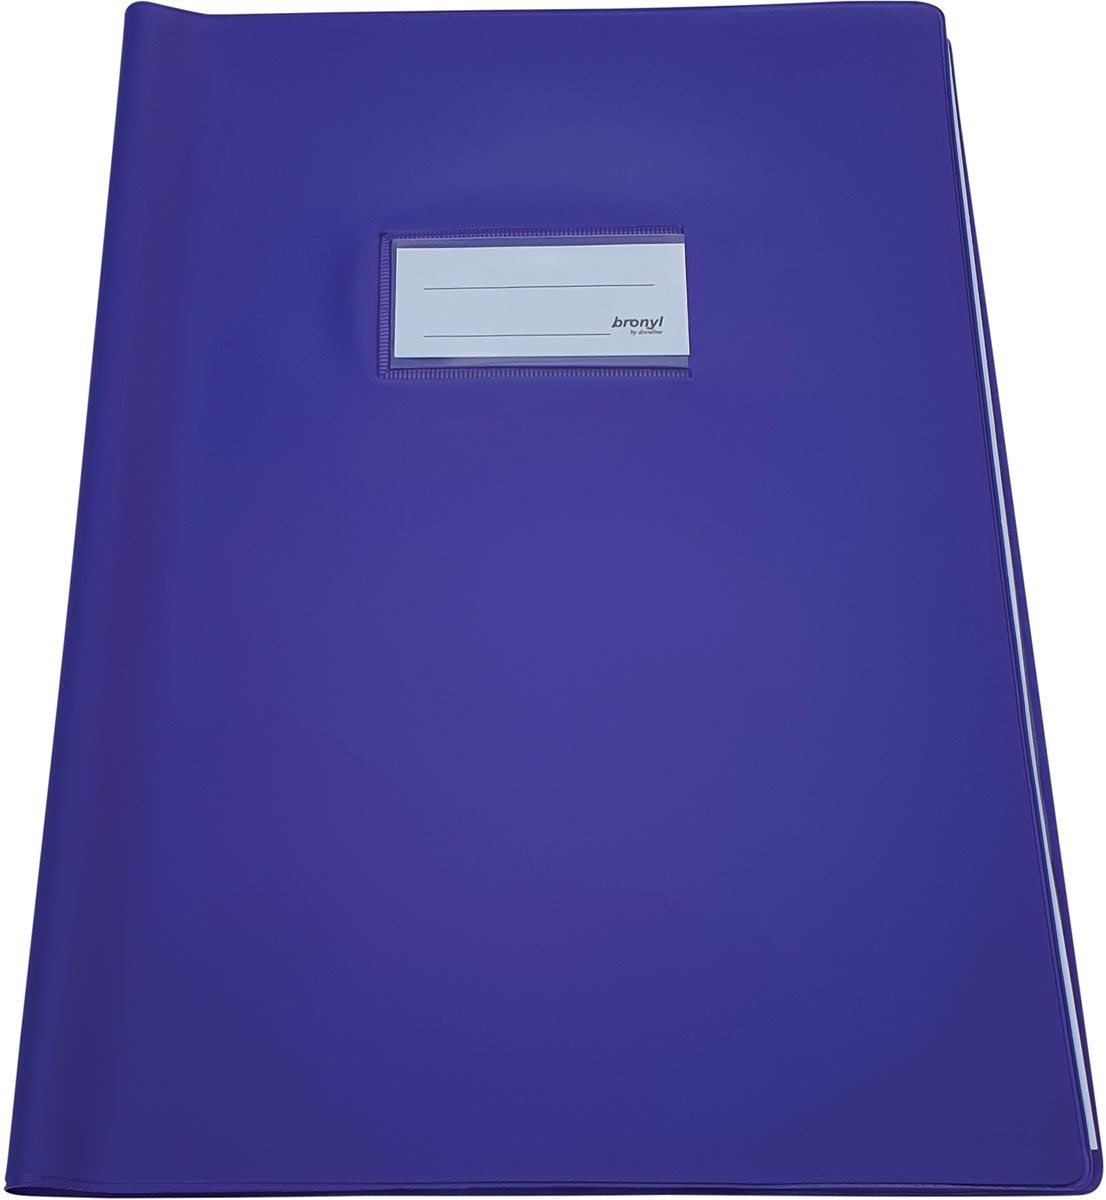 Bronyl schriftomslag ft 21 x 29,7 cm (A4), paars